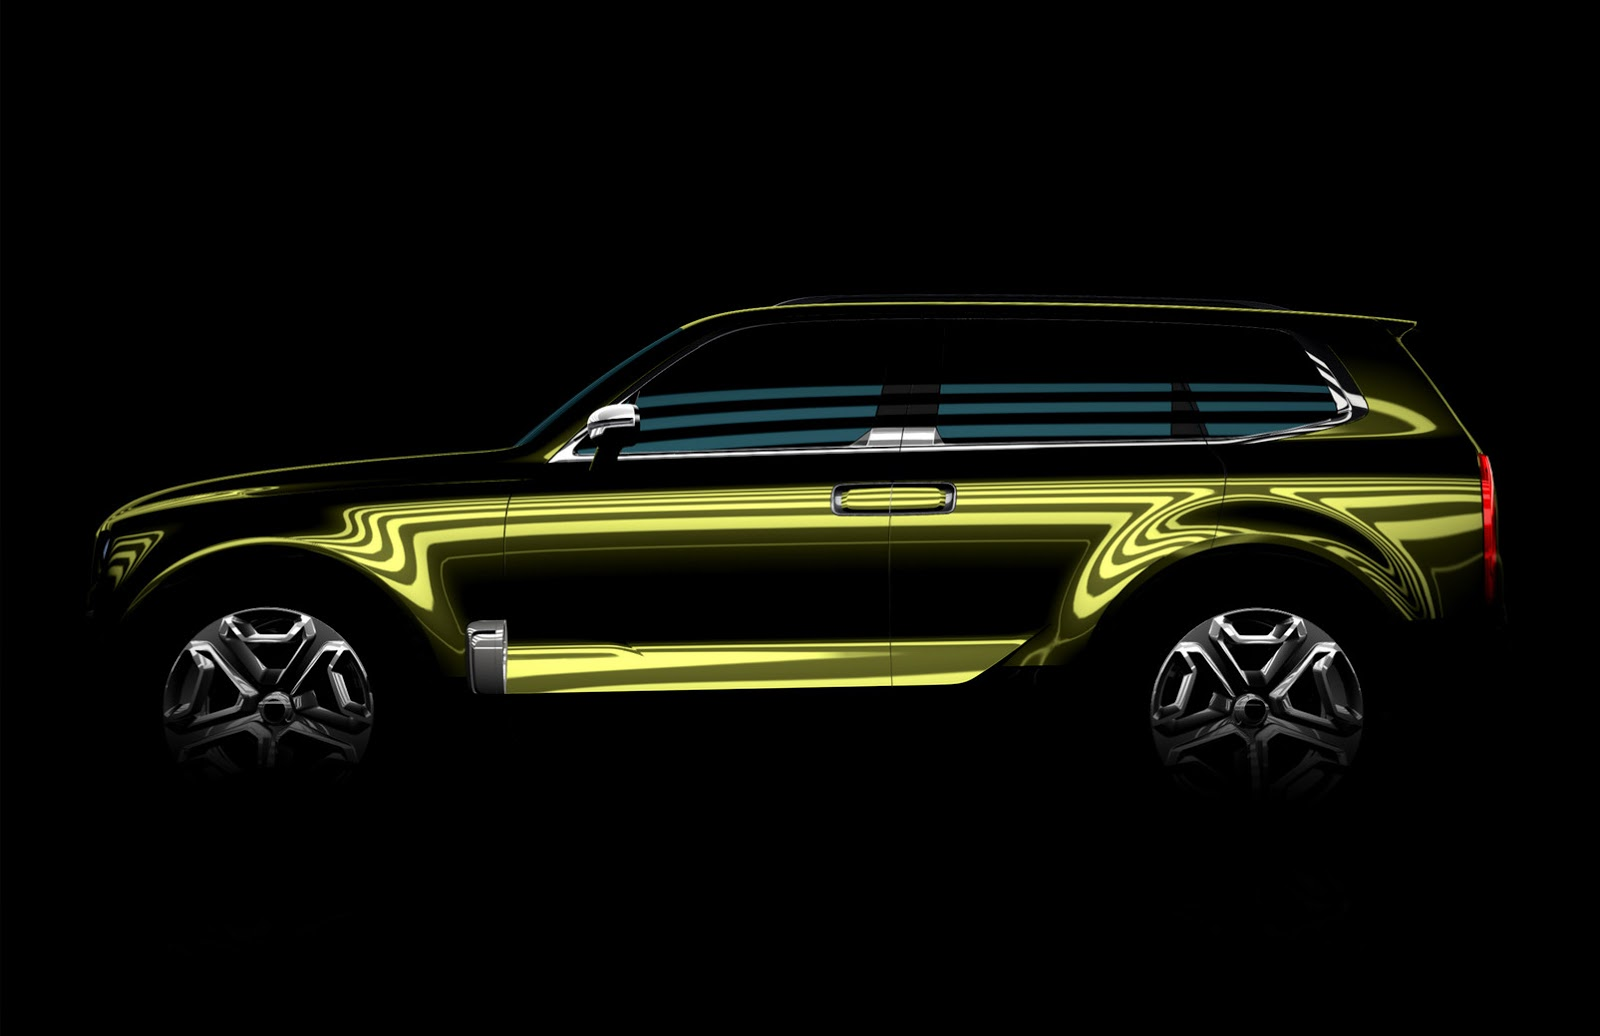 Kia Telluride Concept Teaser Image 1